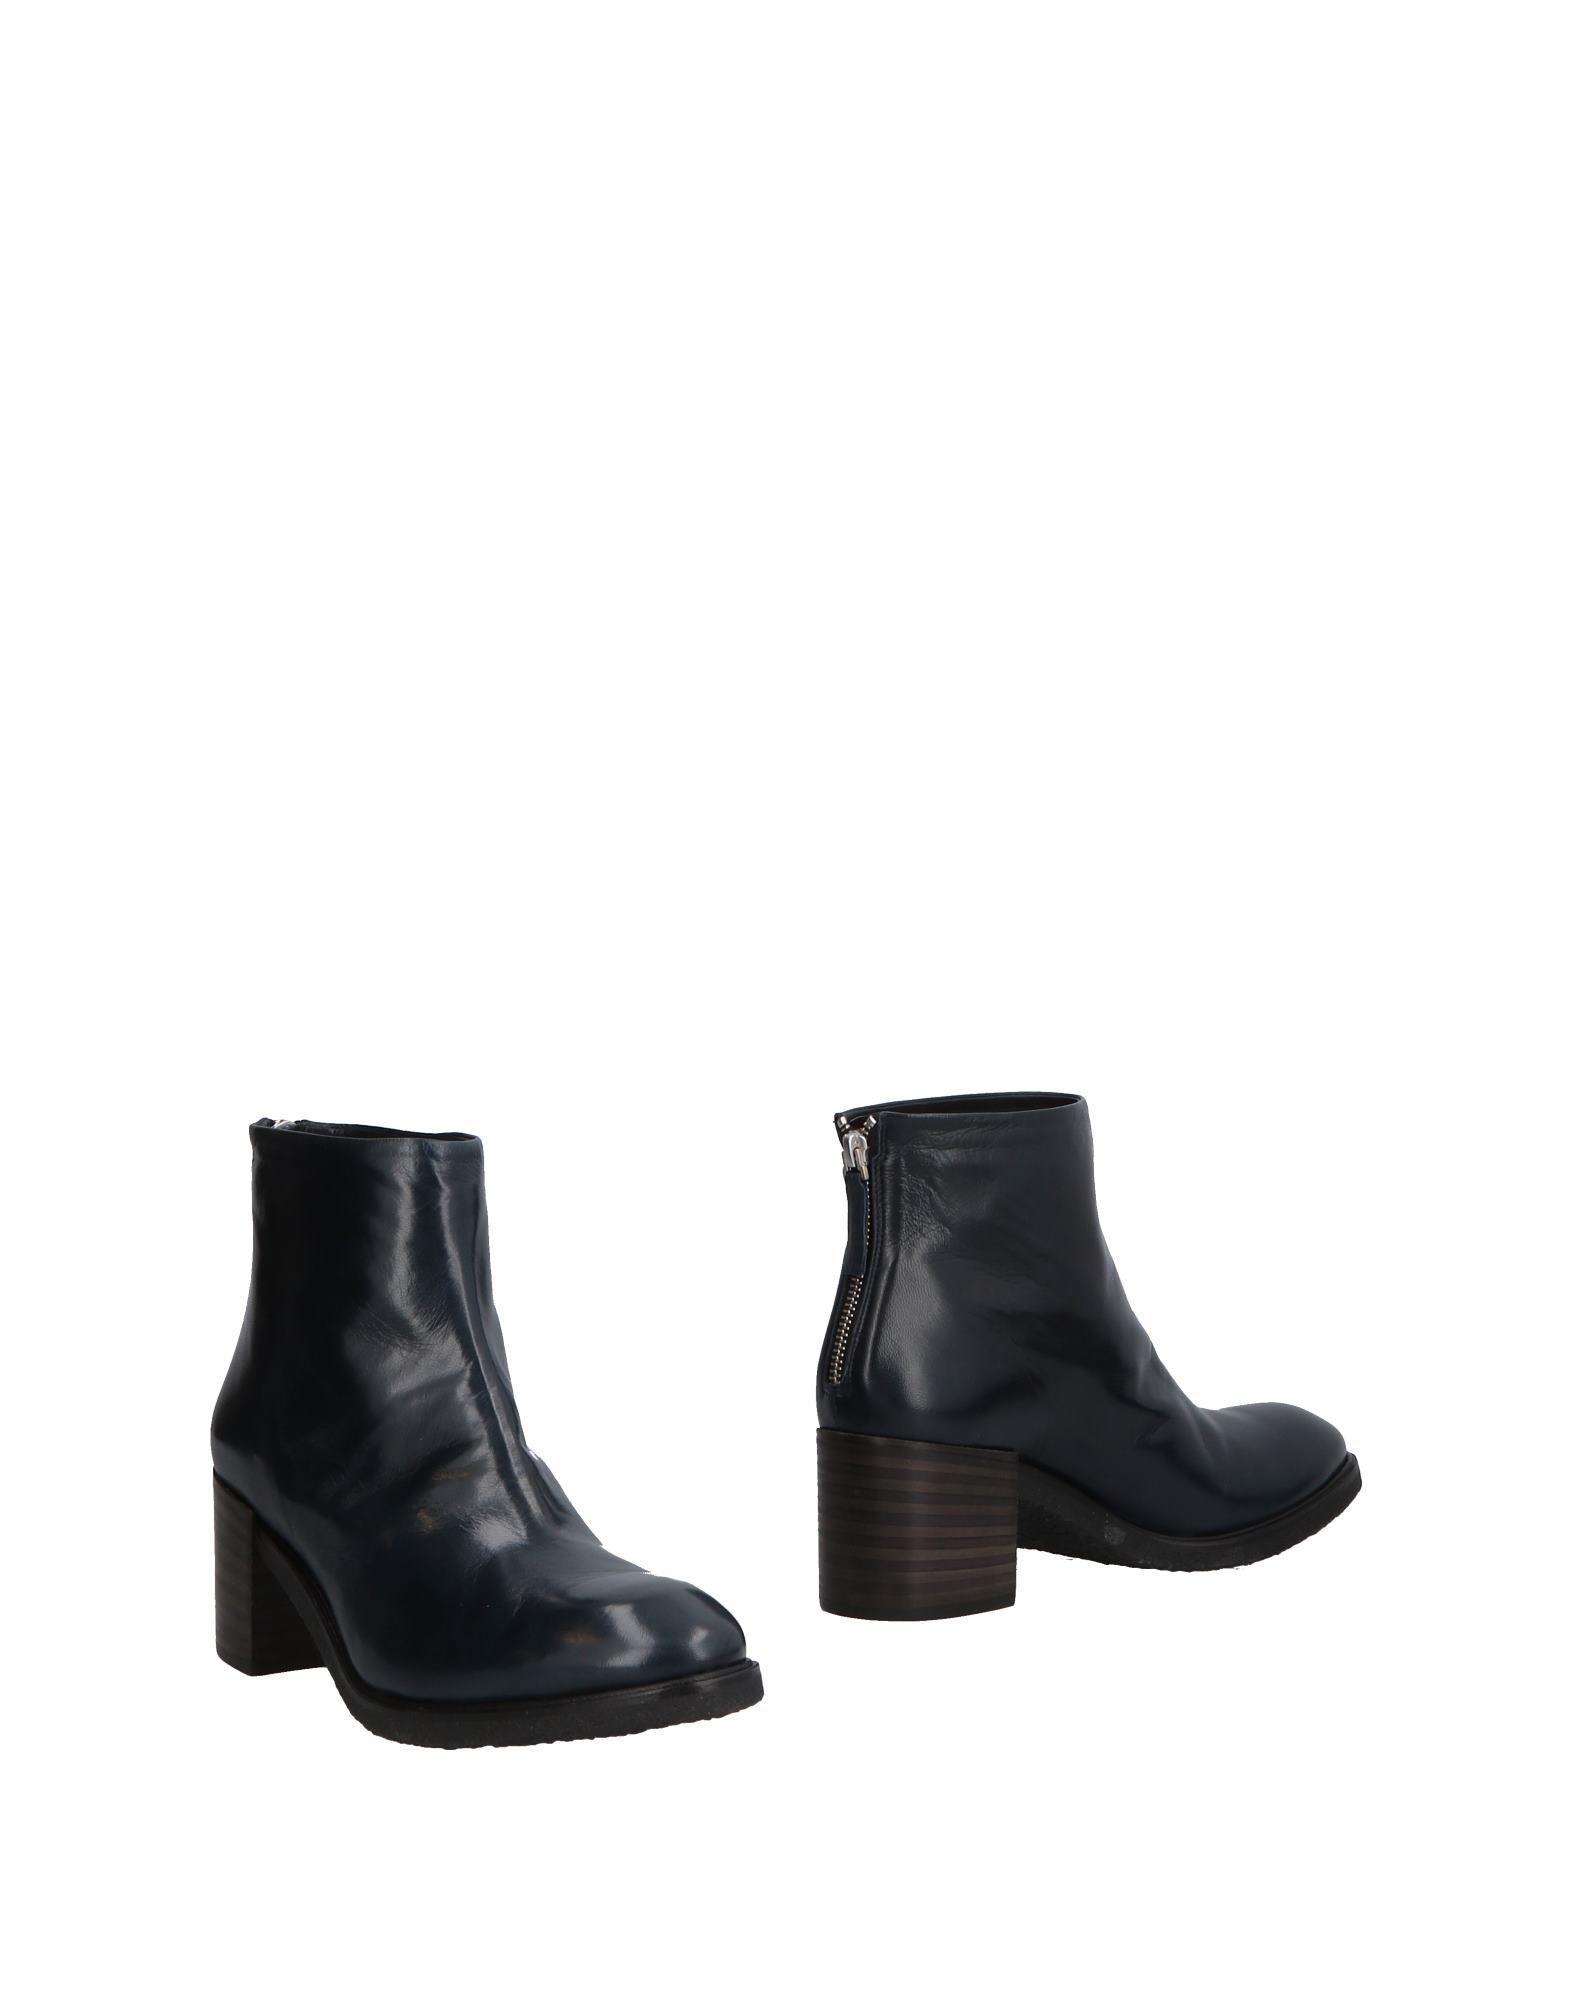 Pomme 11485462SQ D'or Stiefelette Damen  11485462SQ Pomme Neue Schuhe 0adedc